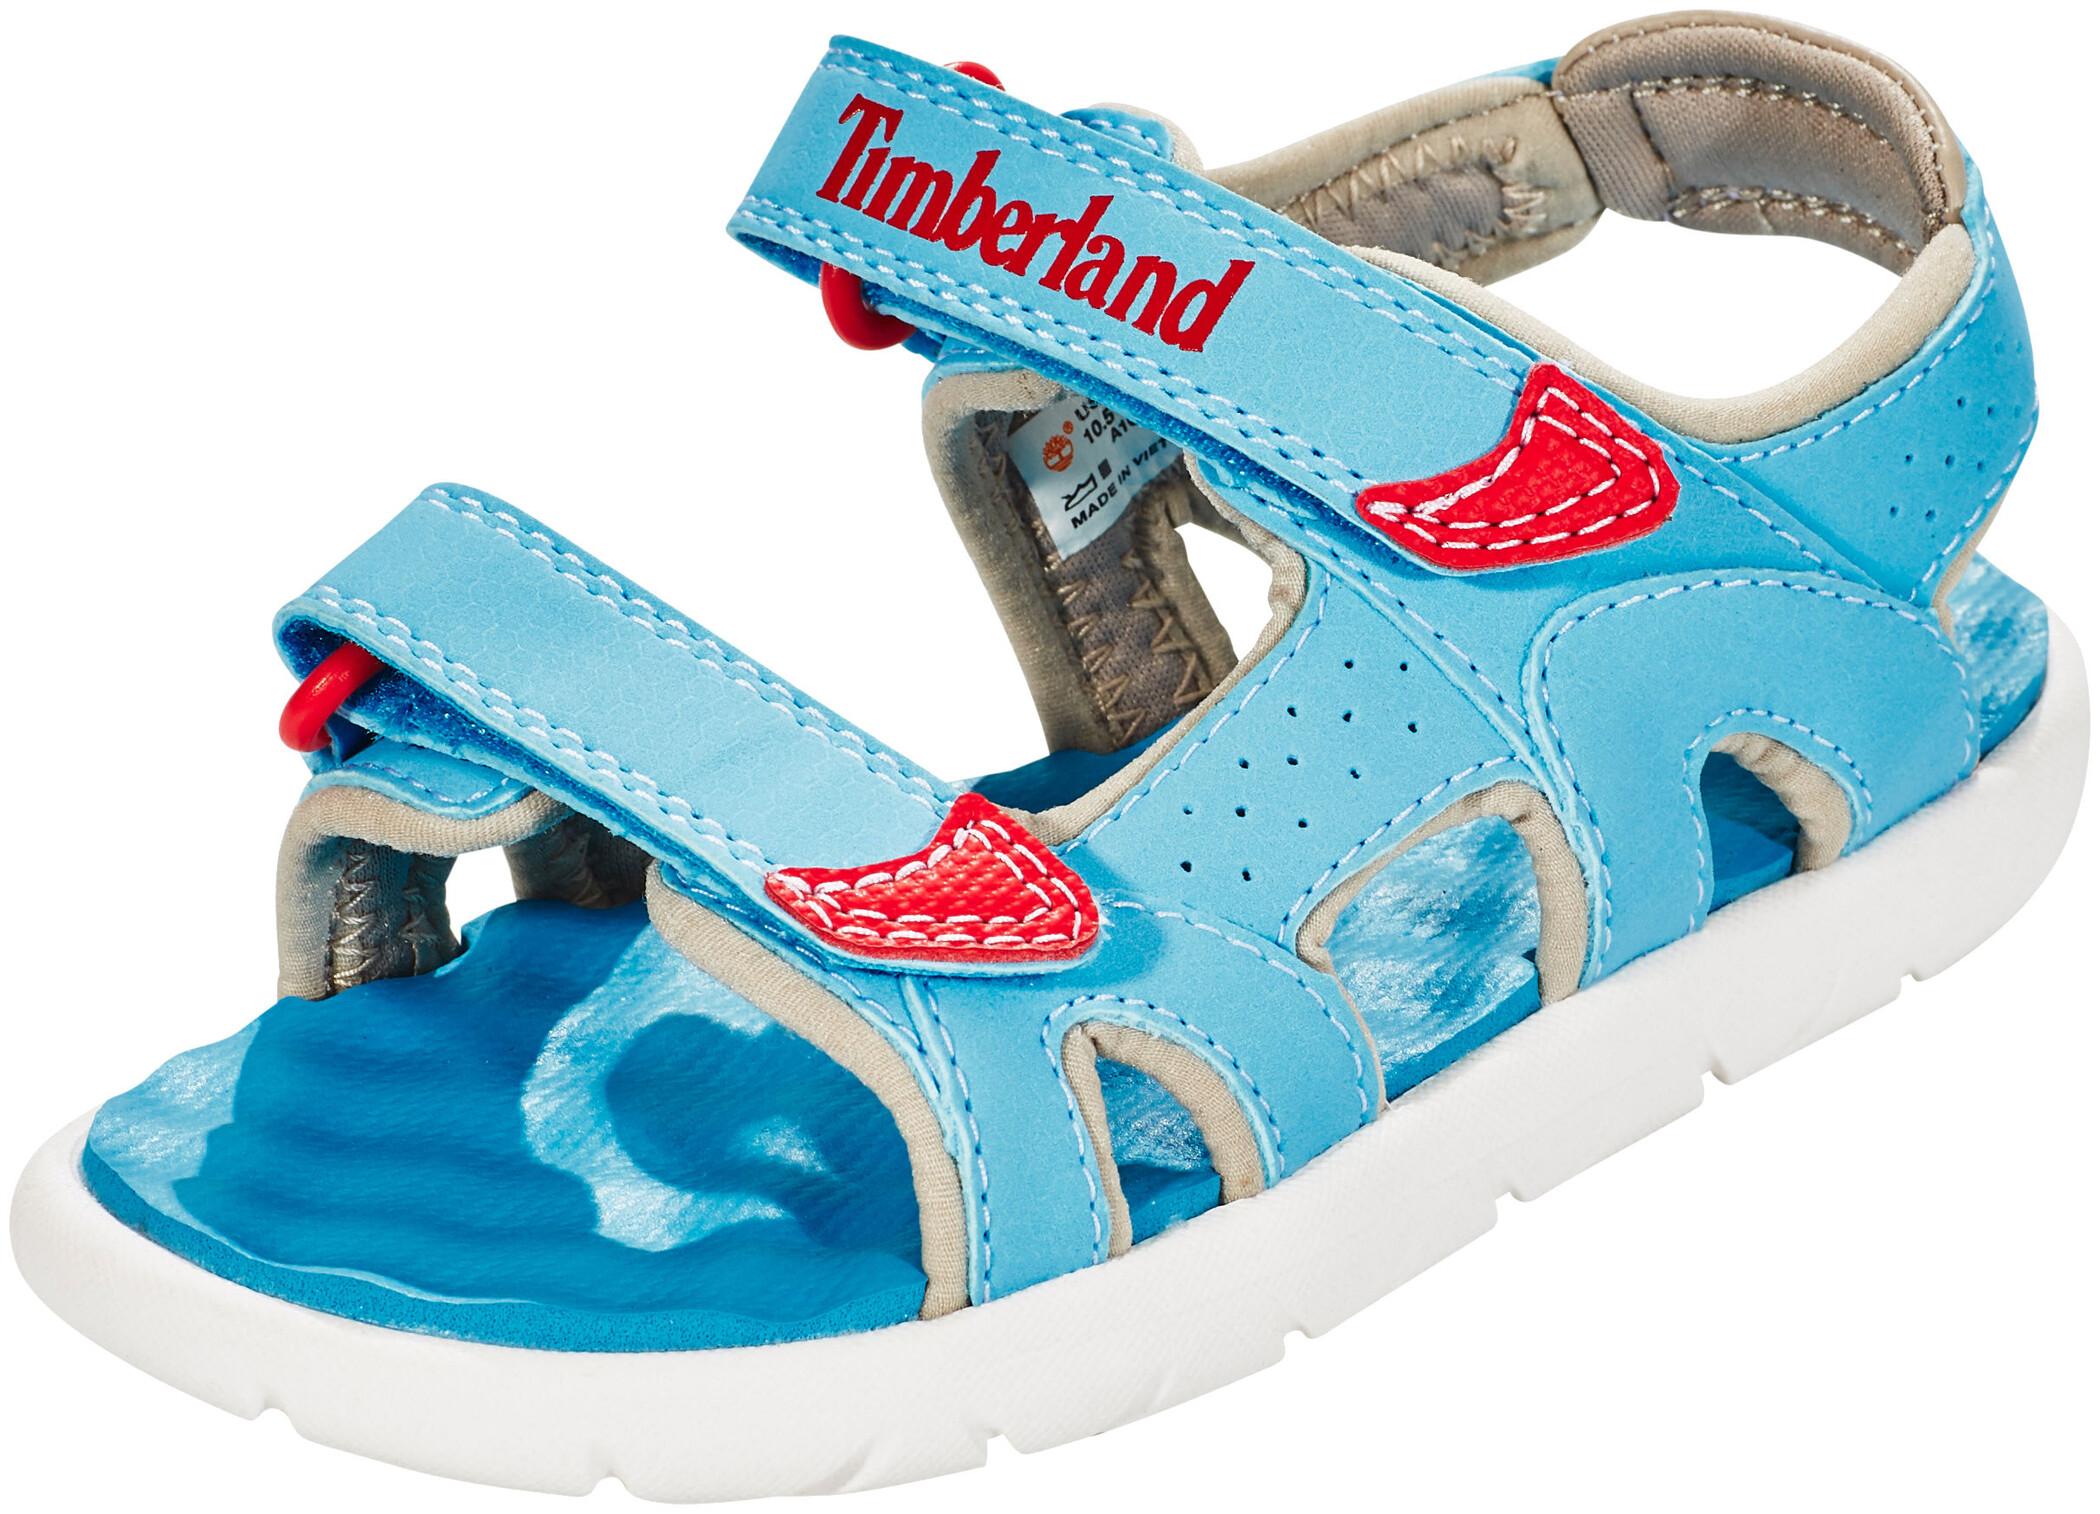 Kamik Kids Match Blau, Kinder Sandale, Größe EU 35 - Farbe Teal